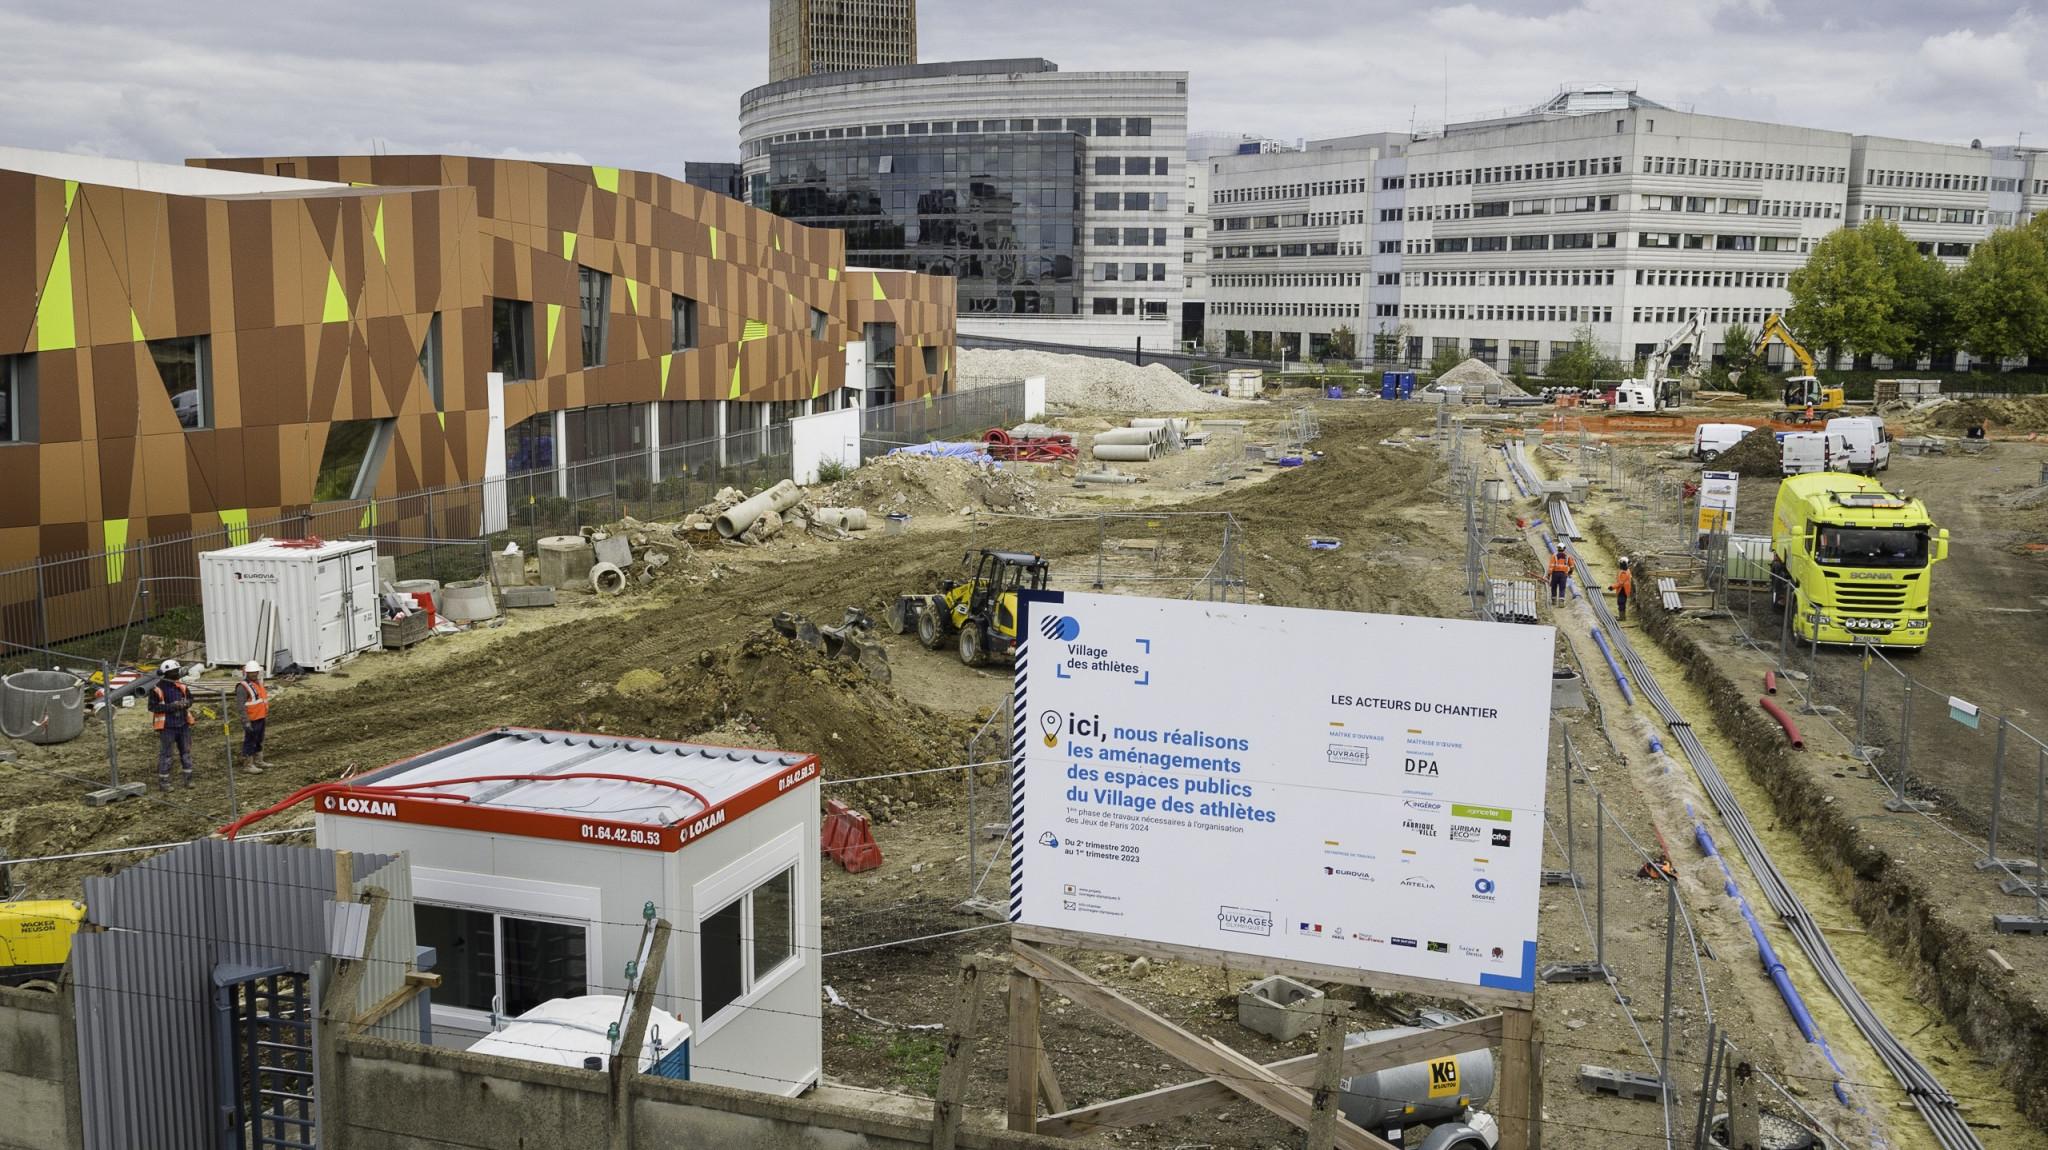 Saint-Denis motorway plans accelerate for Paris 2024 despite local opposition